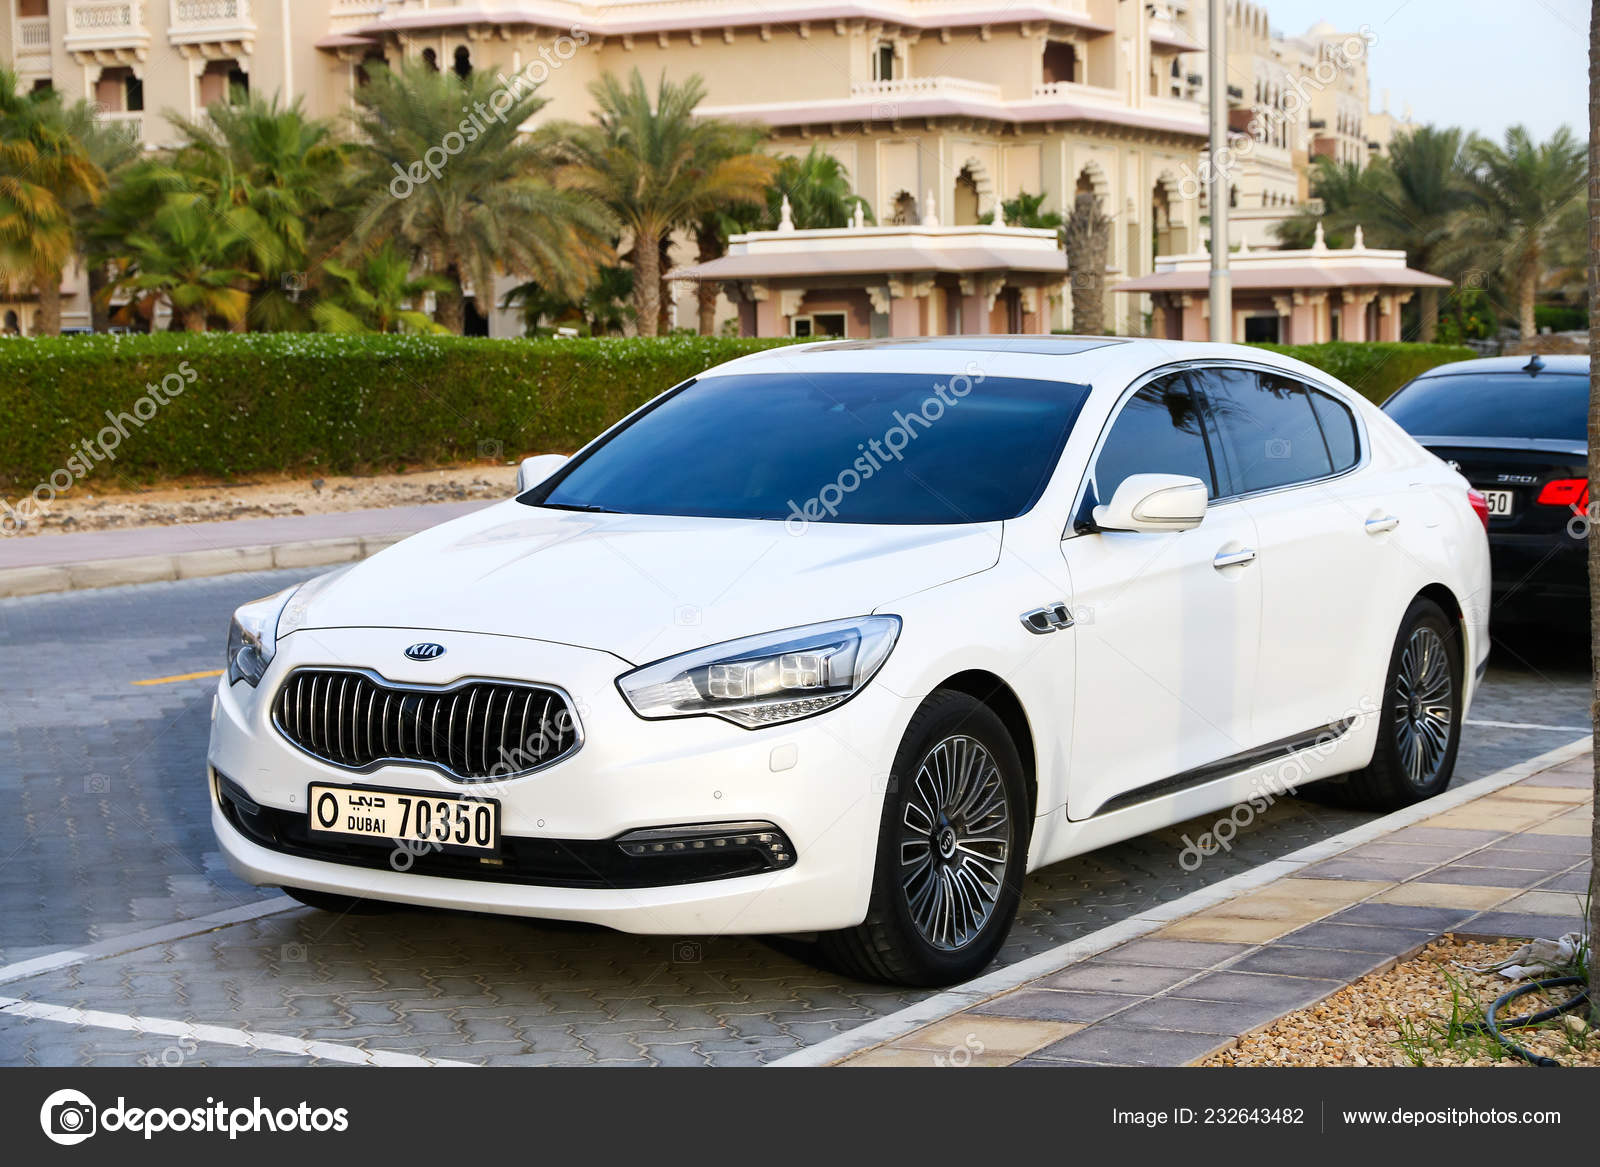 Dubai Uae November 2018 Motor Car Kia Quoris City Street Stock Editorial Photo C Artzzz 232643482